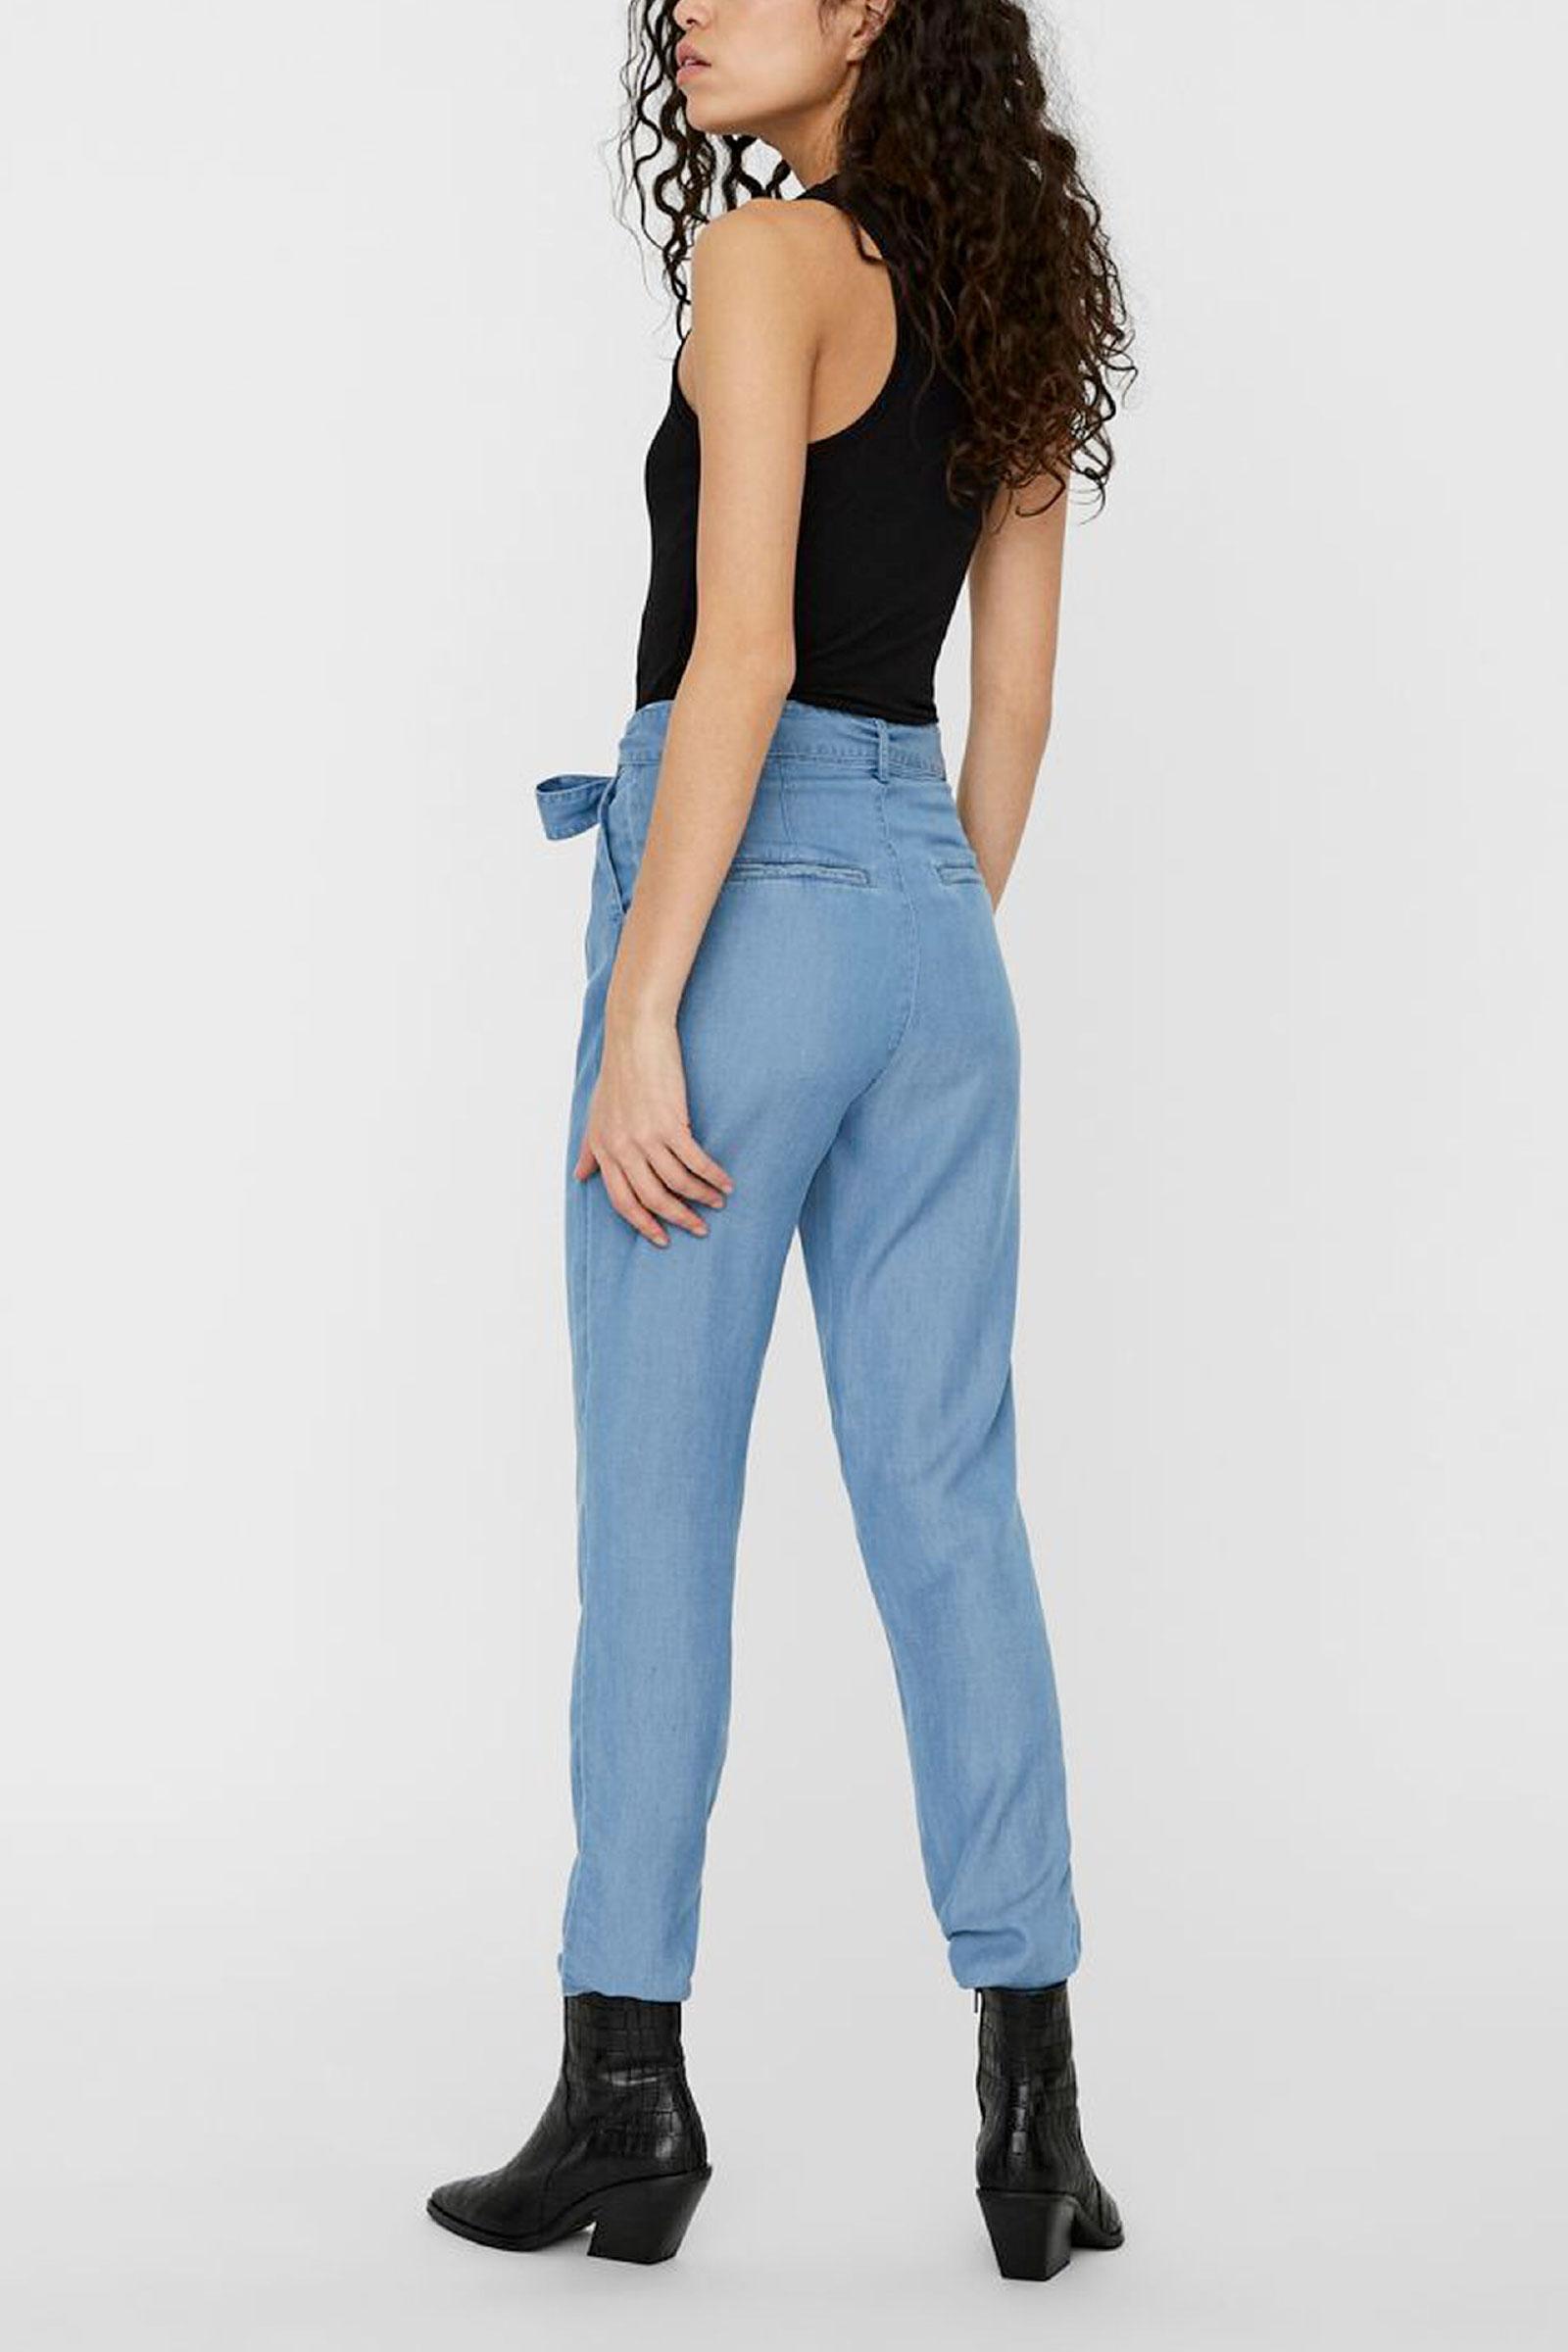 VERO MODA | Trousers | 10240442Light Blue Denim